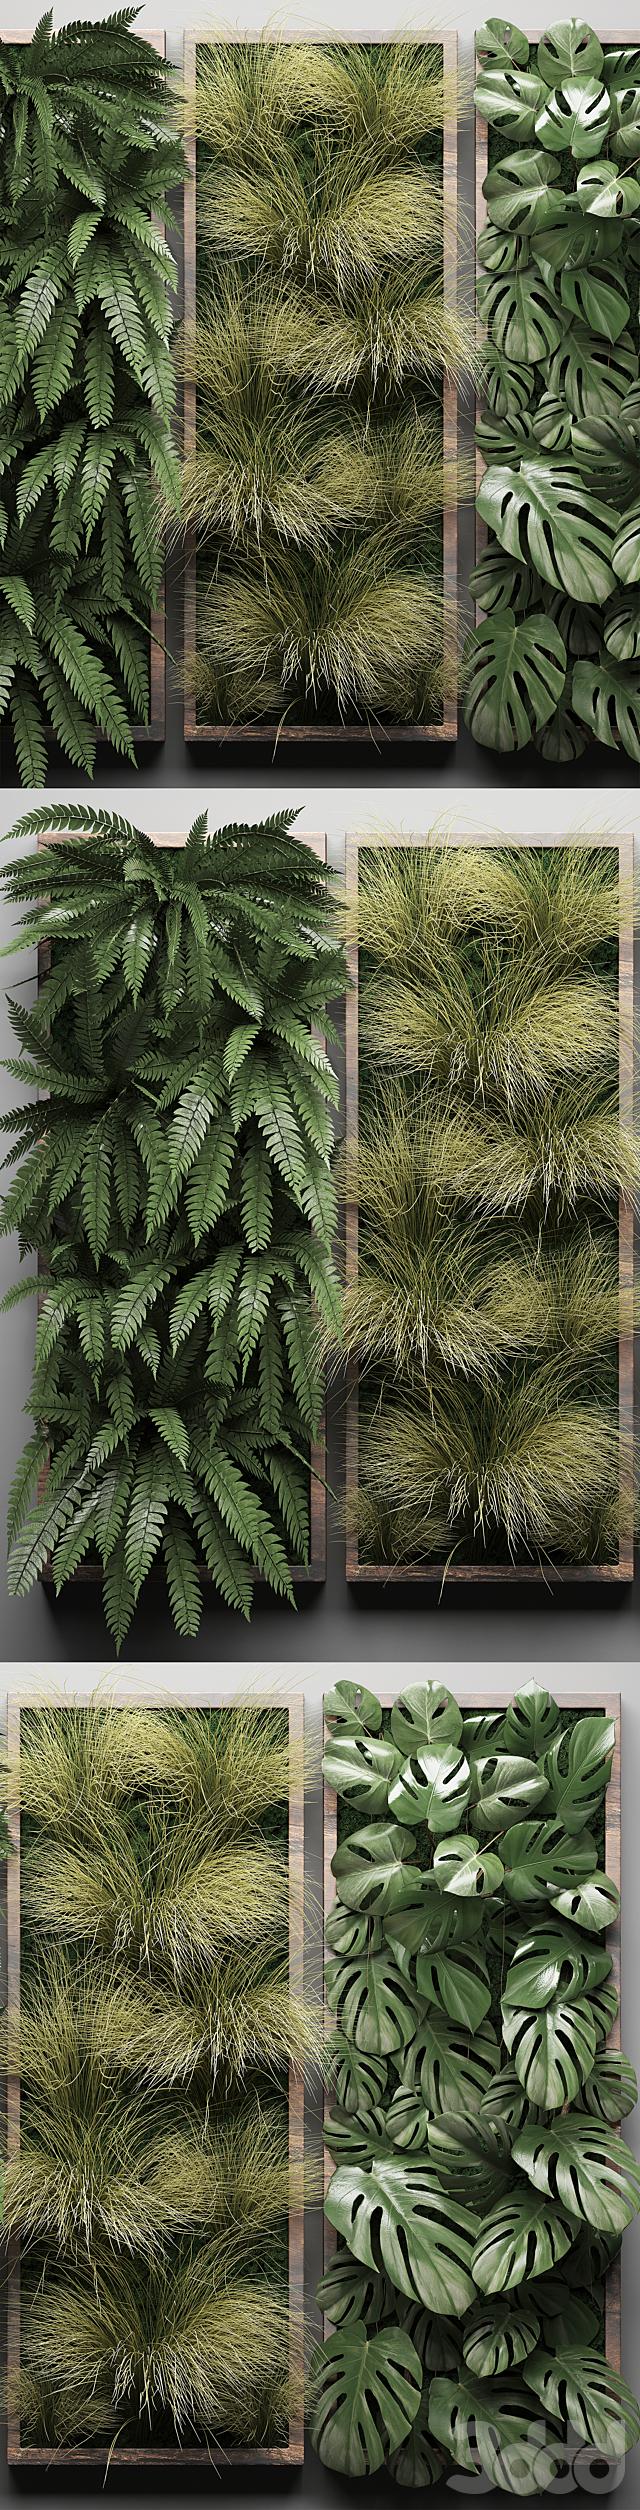 Vertical garden 29.